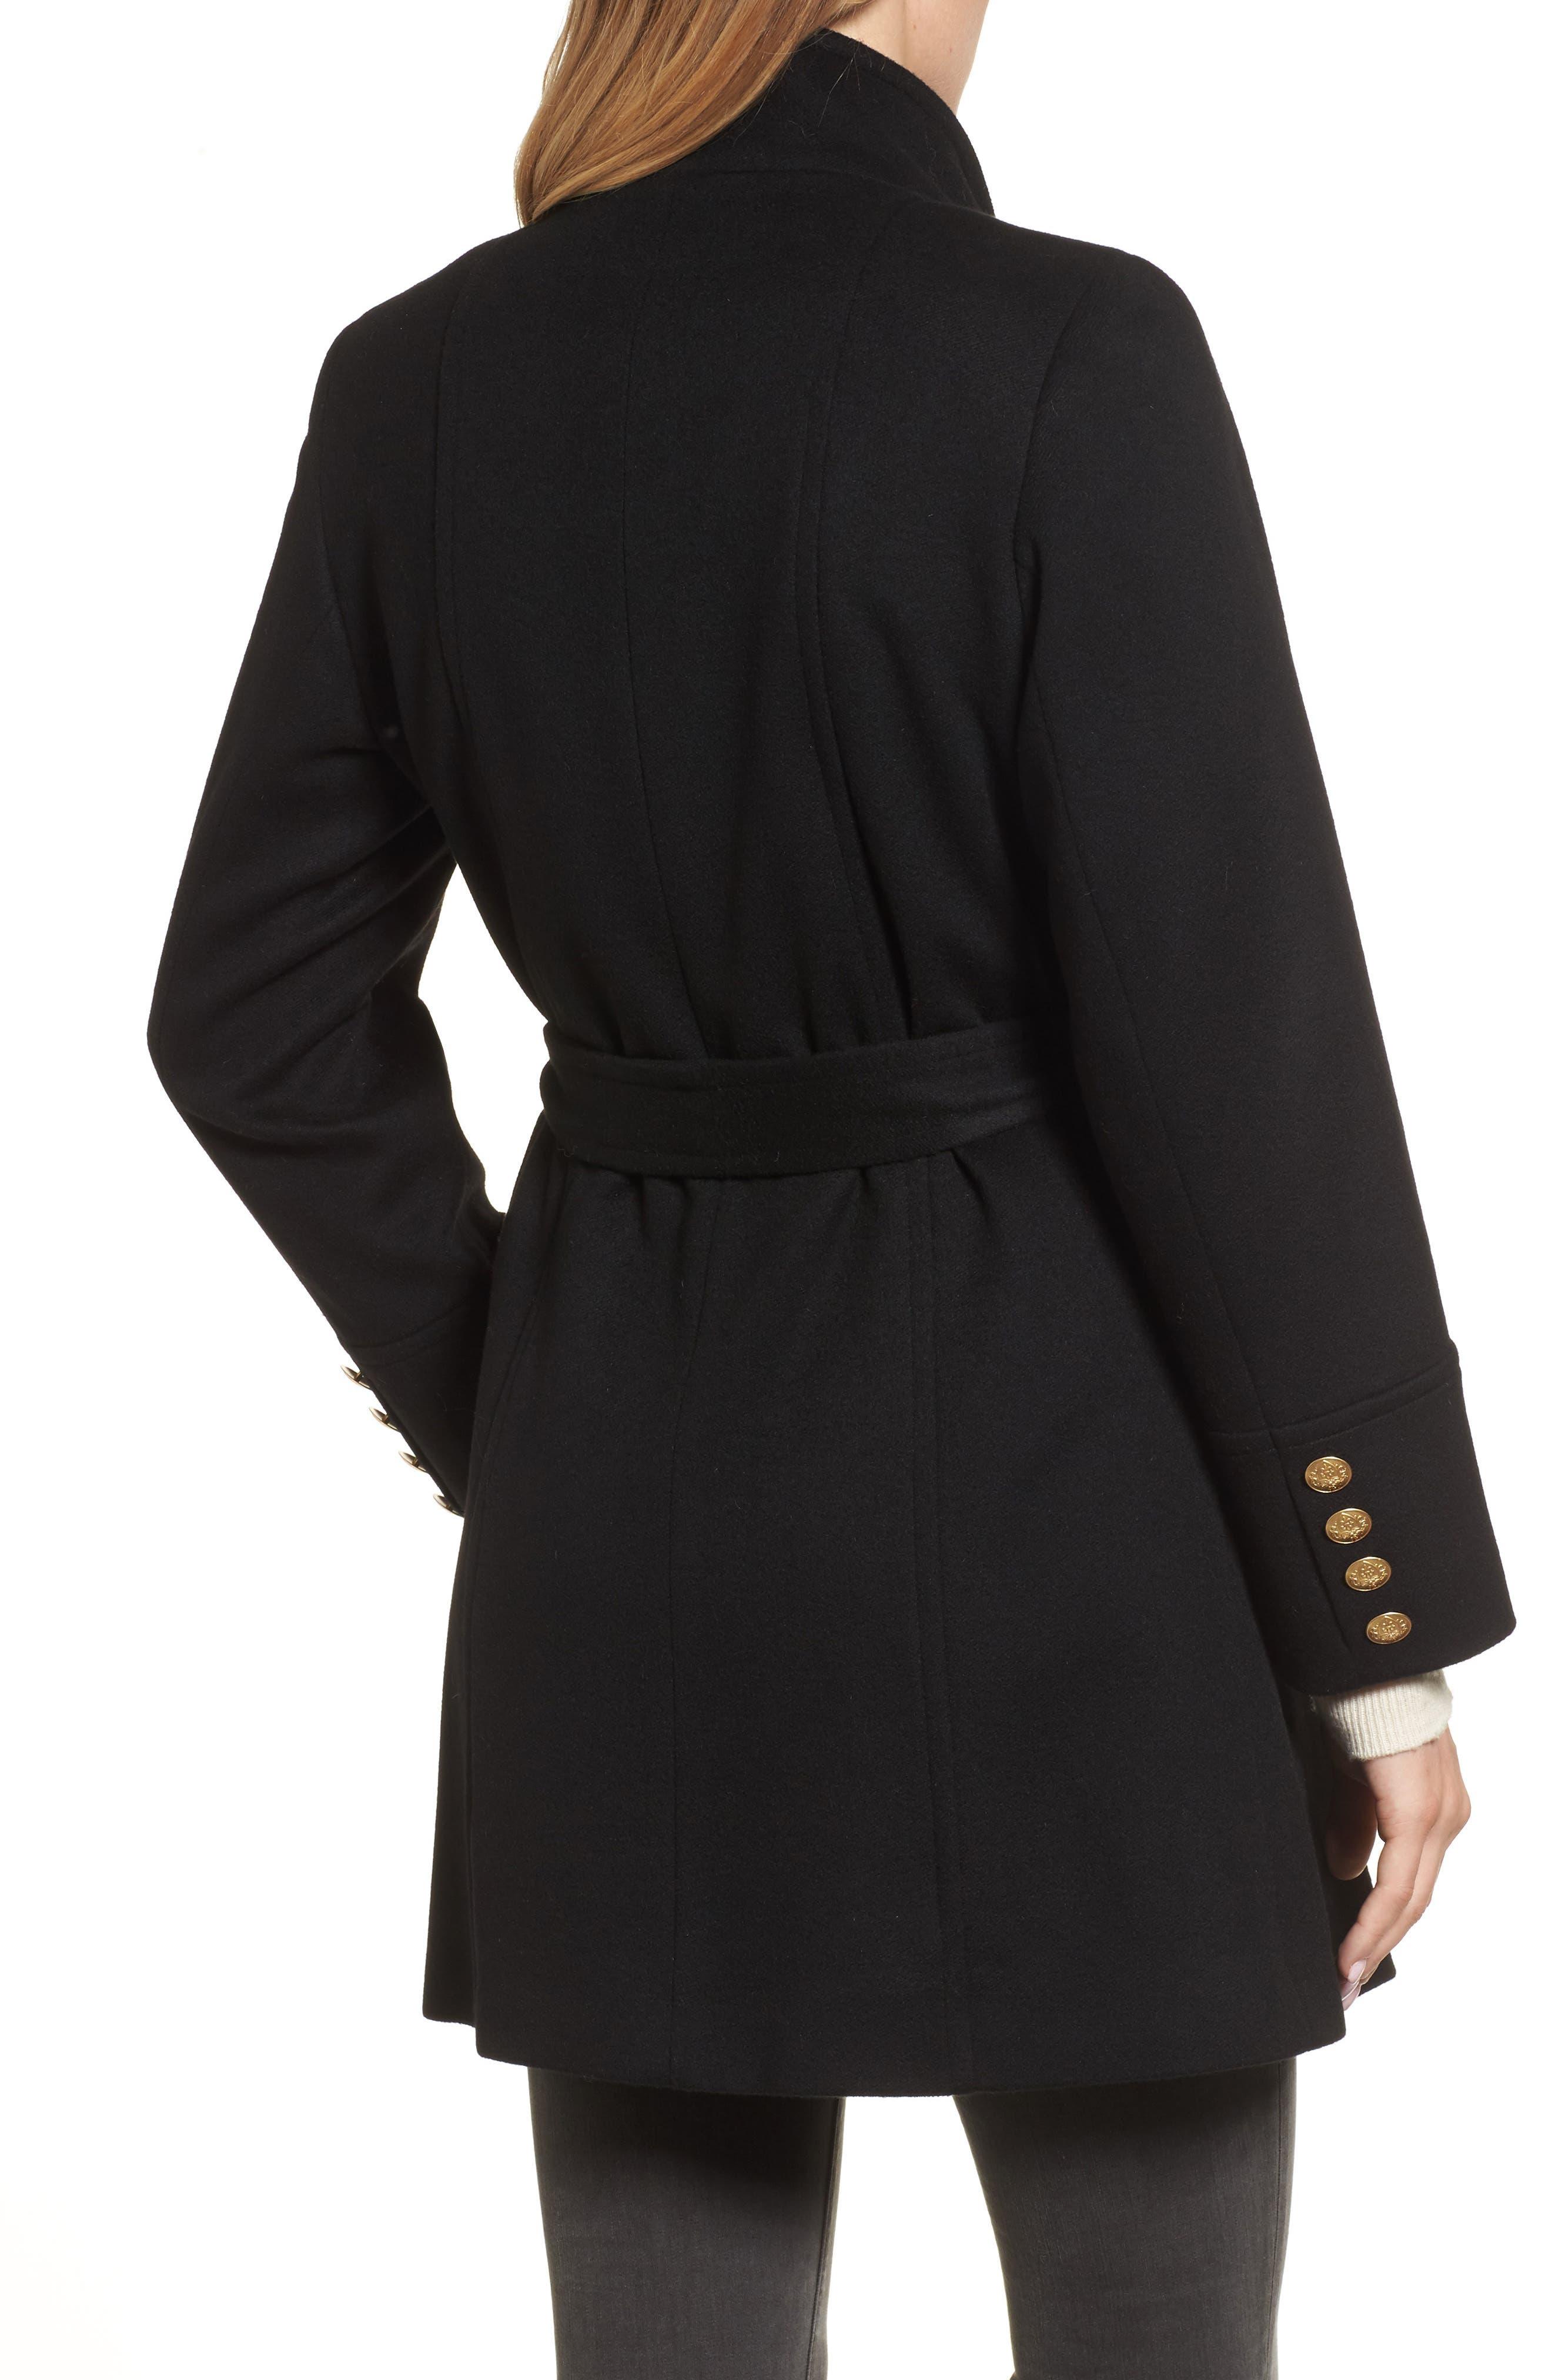 Wool & Cashmere Blend Military Coat,                             Alternate thumbnail 2, color,                             001